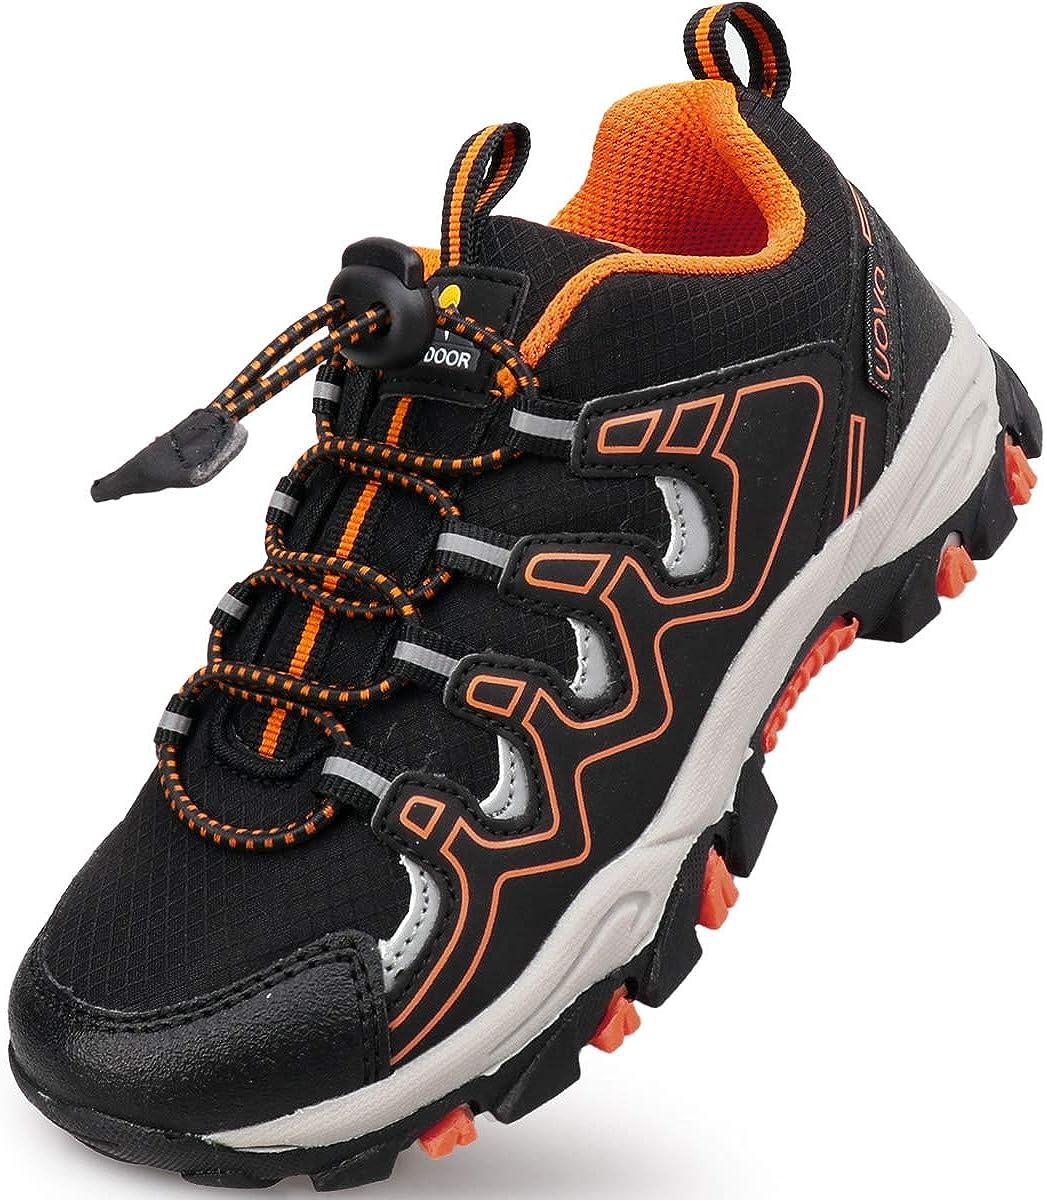 online shop UOVO Boys Ranking TOP17 Shoes Sneakers Tennis Running Waterpro